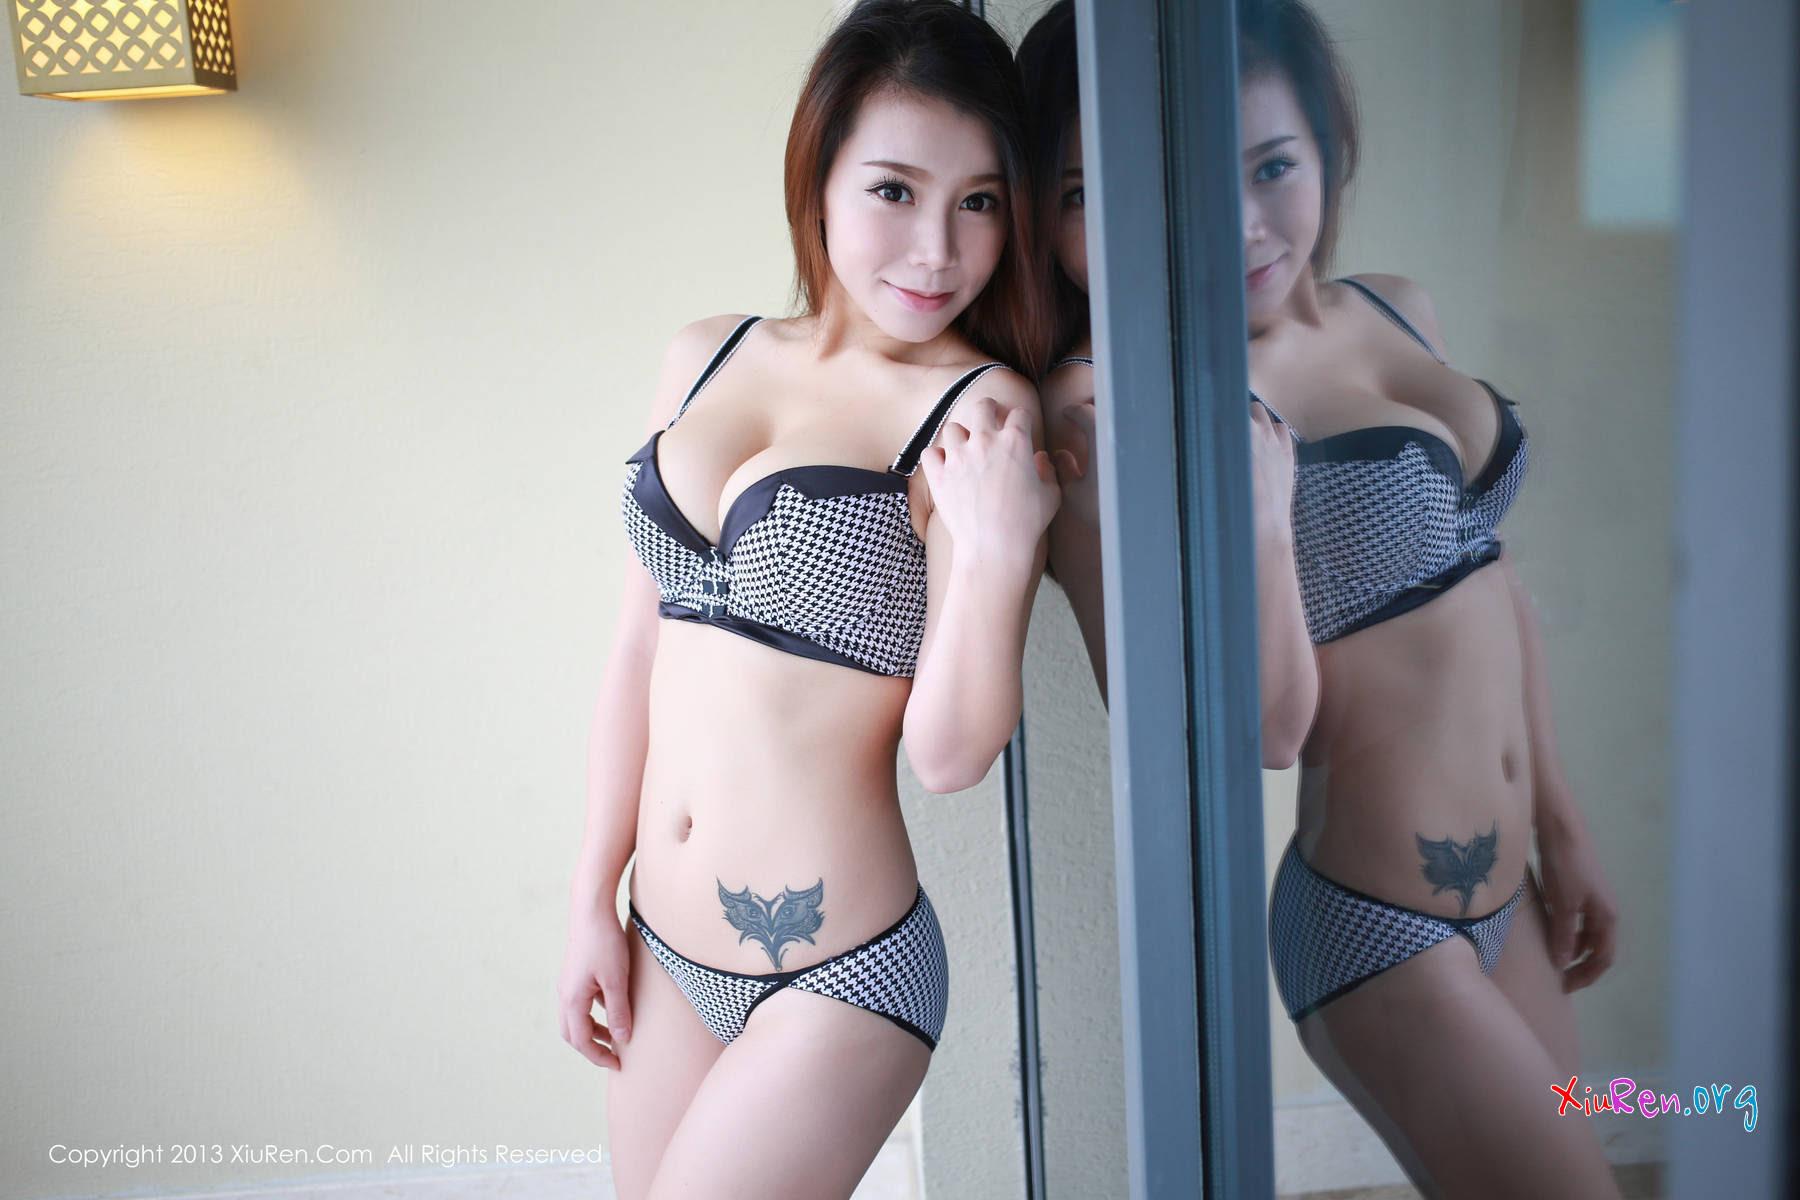 phimvu blog-XiuRen-N00058-vetiver-0017.jpg